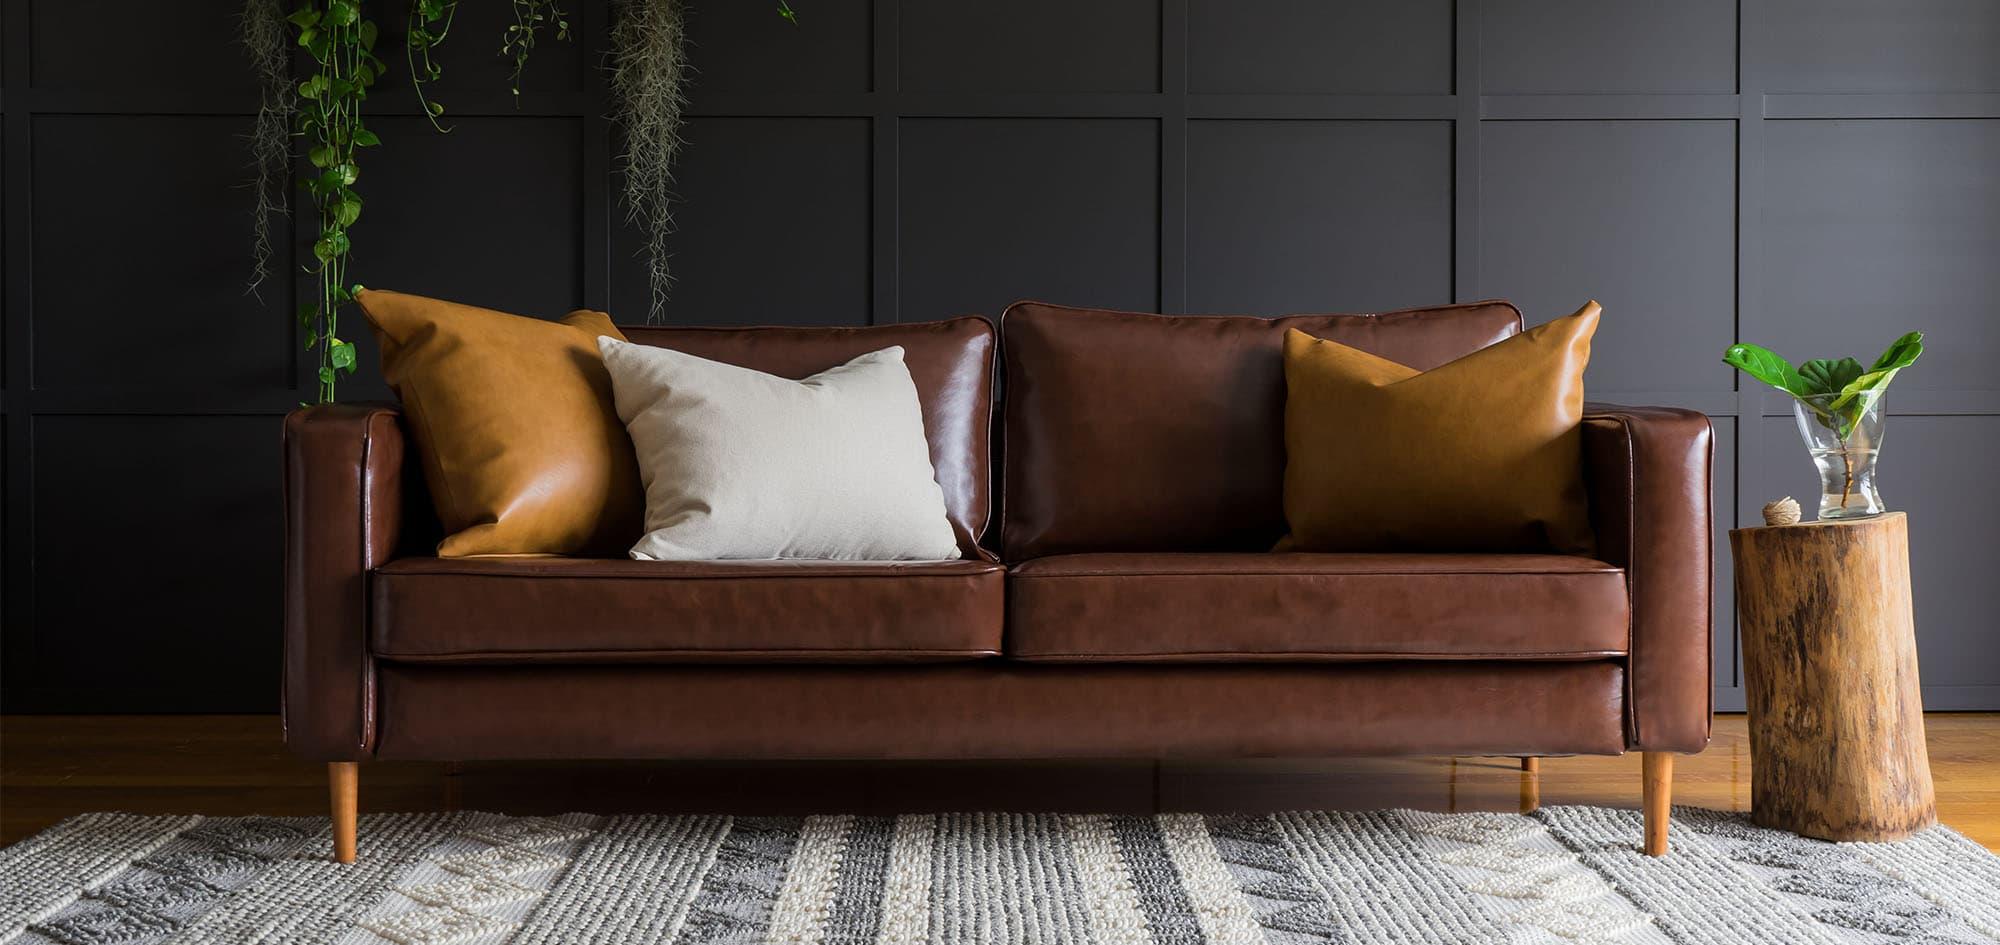 IKEA Karlstad 3er Sofabezug aus Urbanskin Chestnut Bycast-Leder